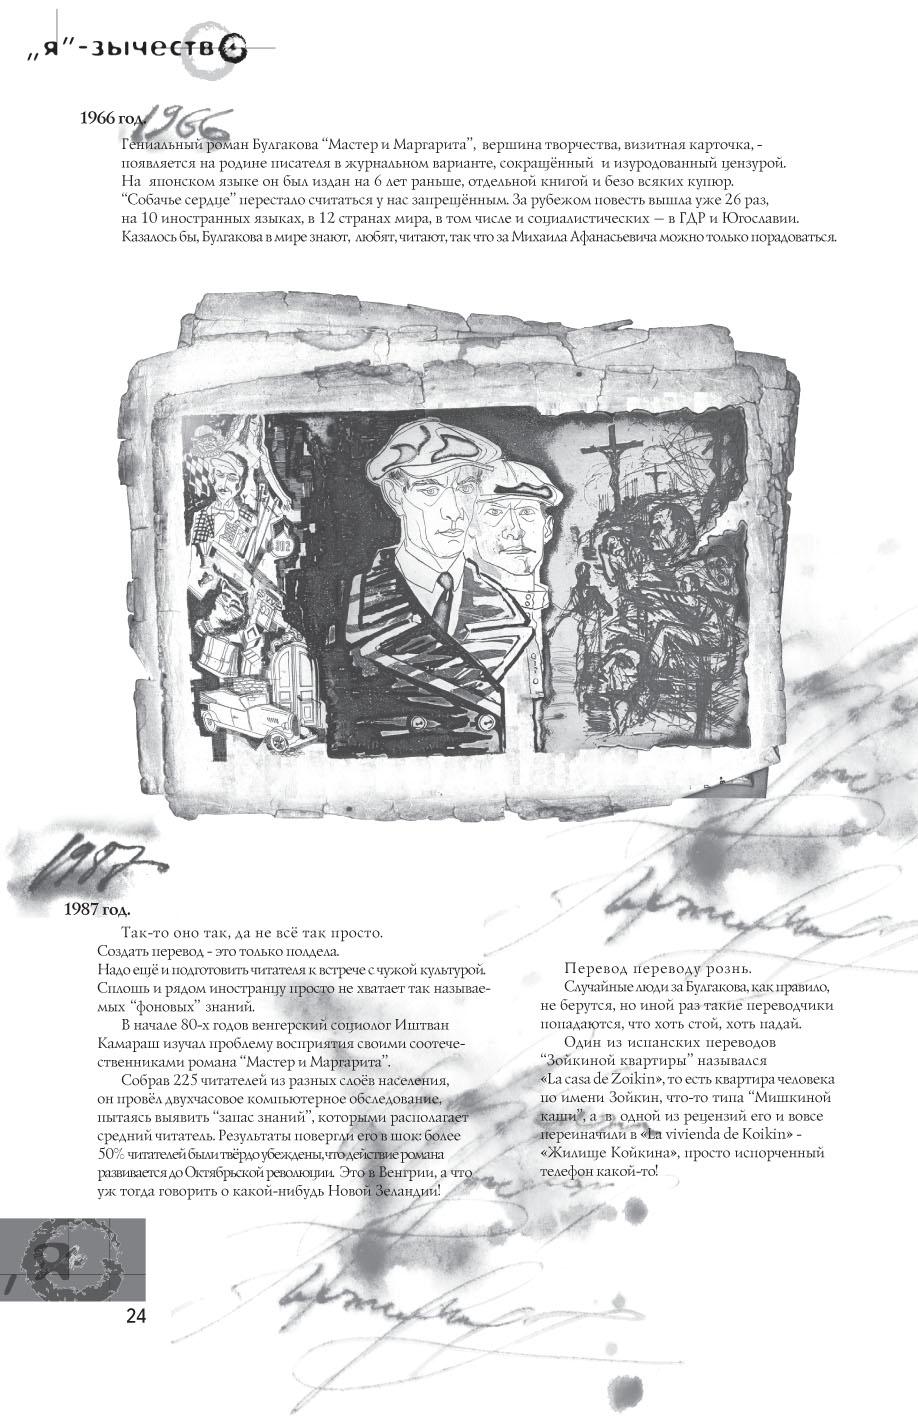 svod 12.p65